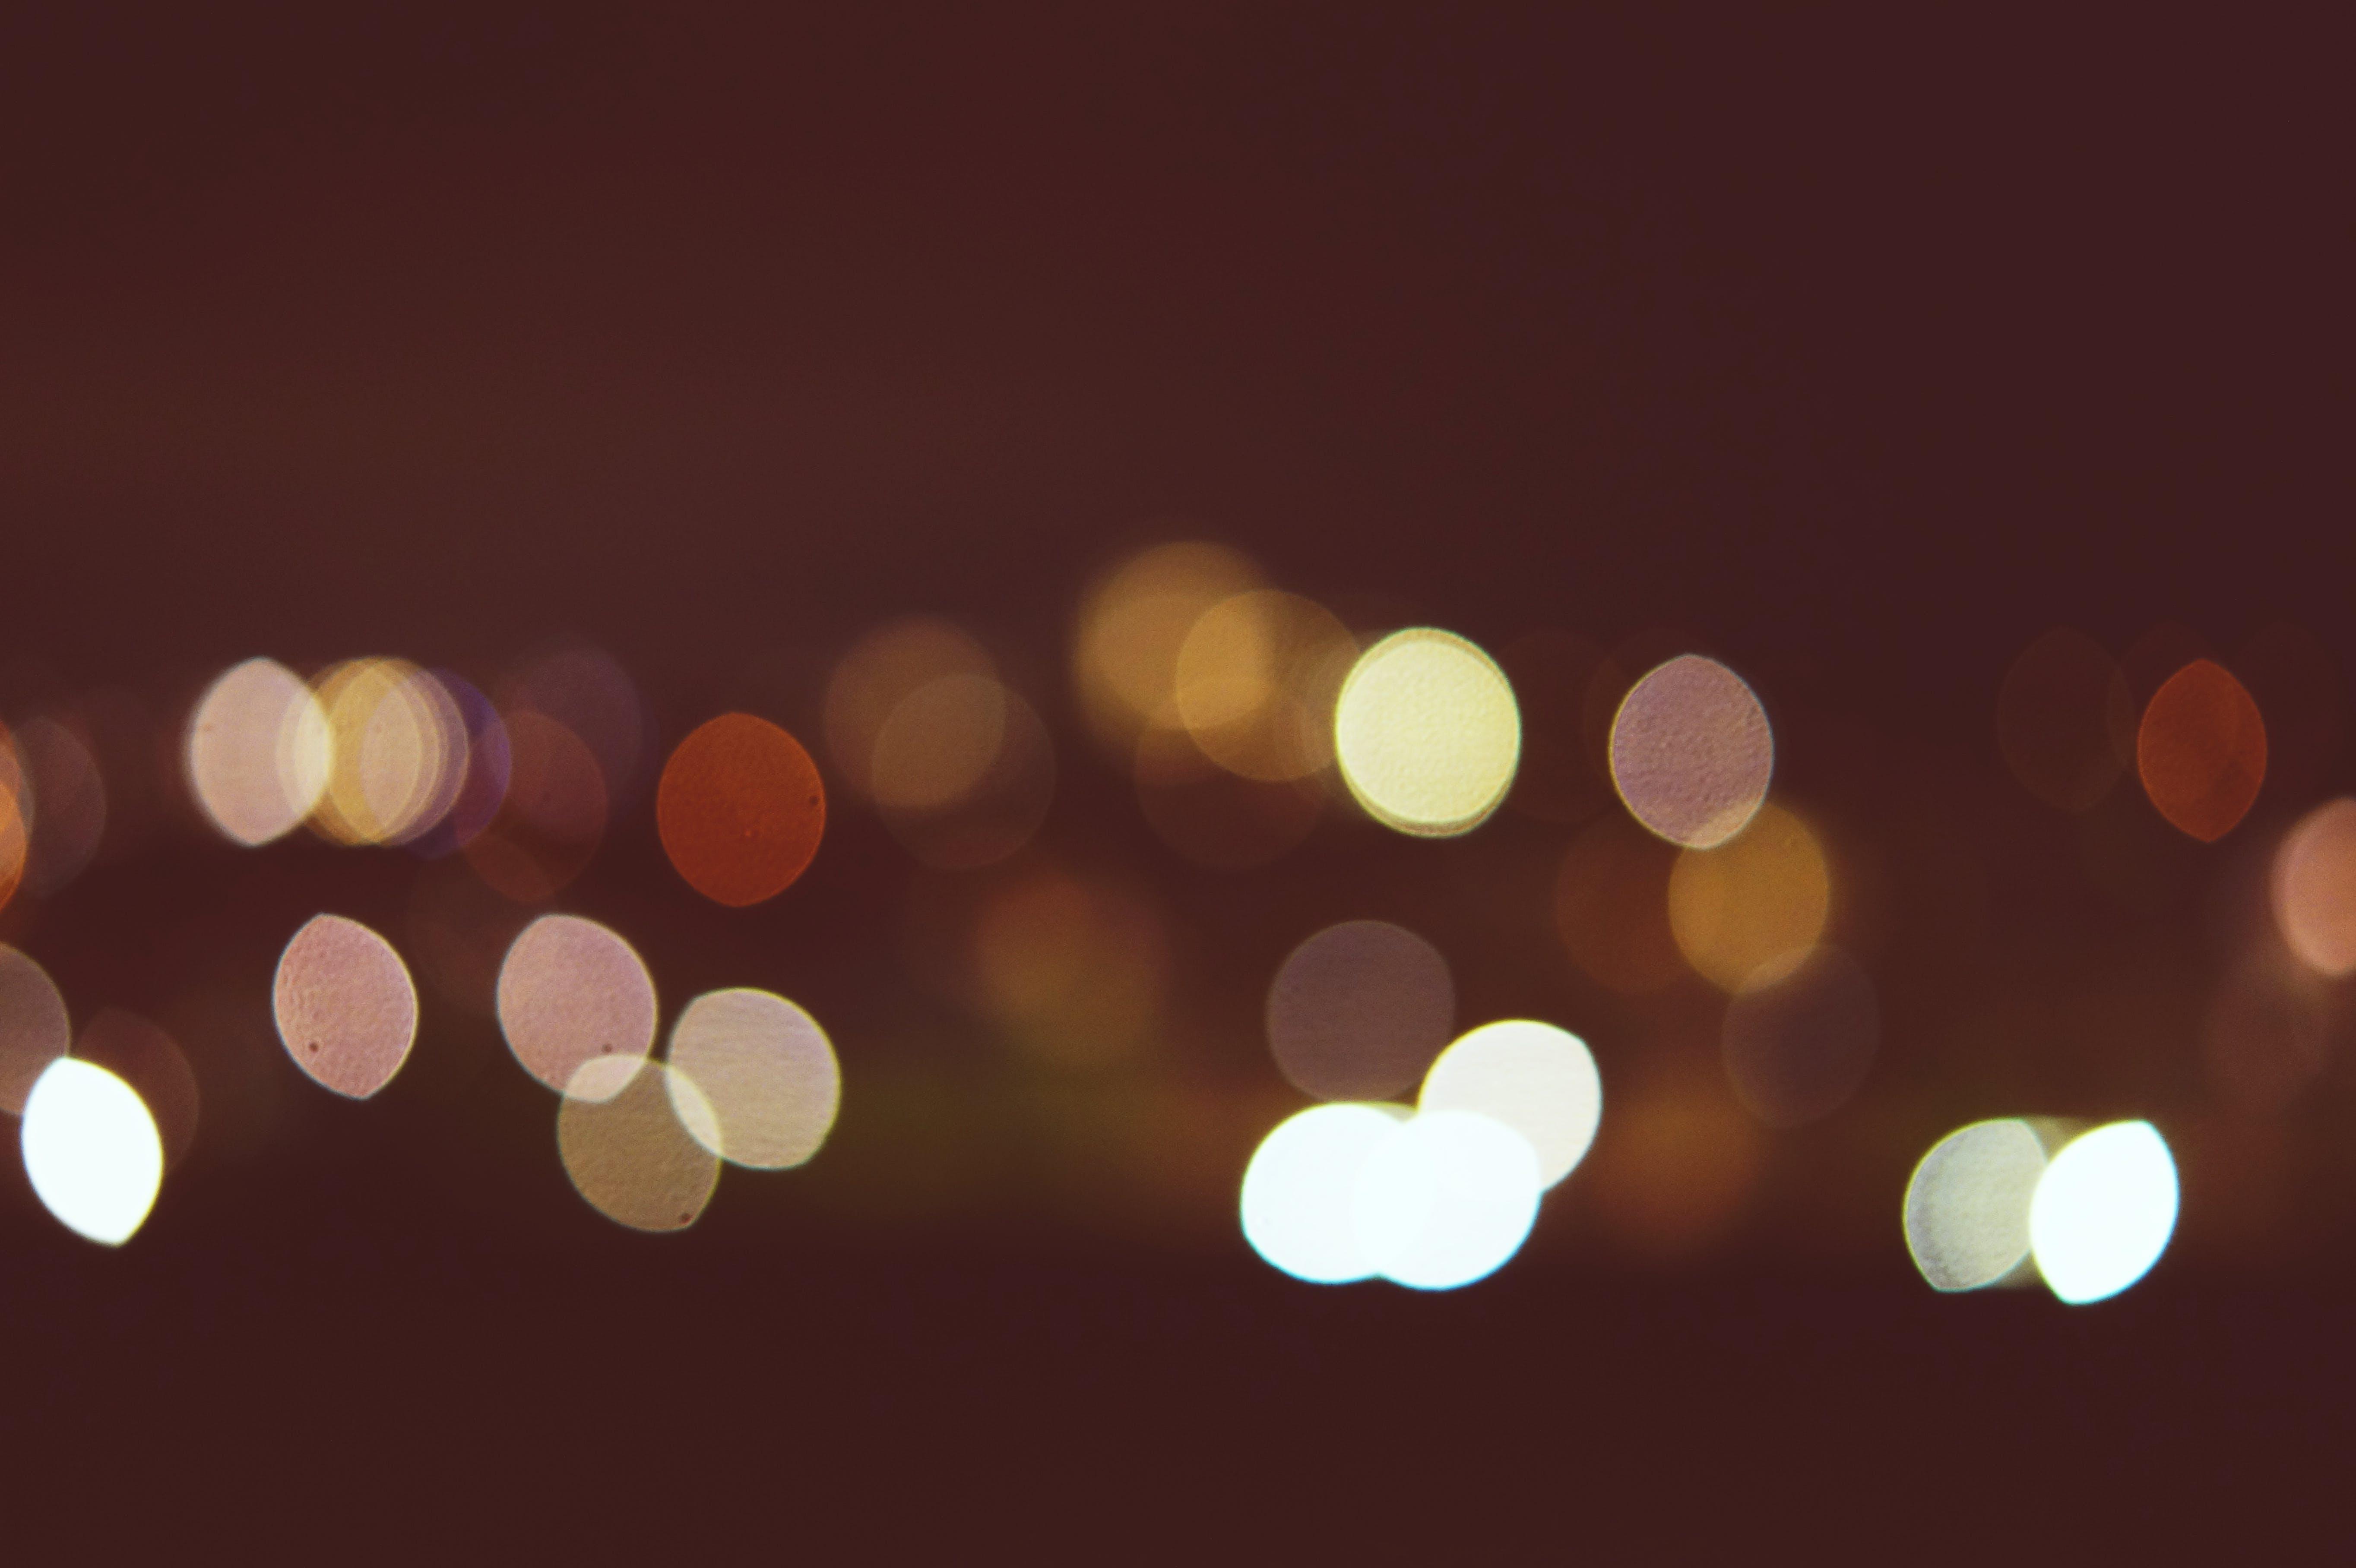 Kostenloses Stock Foto zu beleuchtet, beleuchtung, dunkel, farben